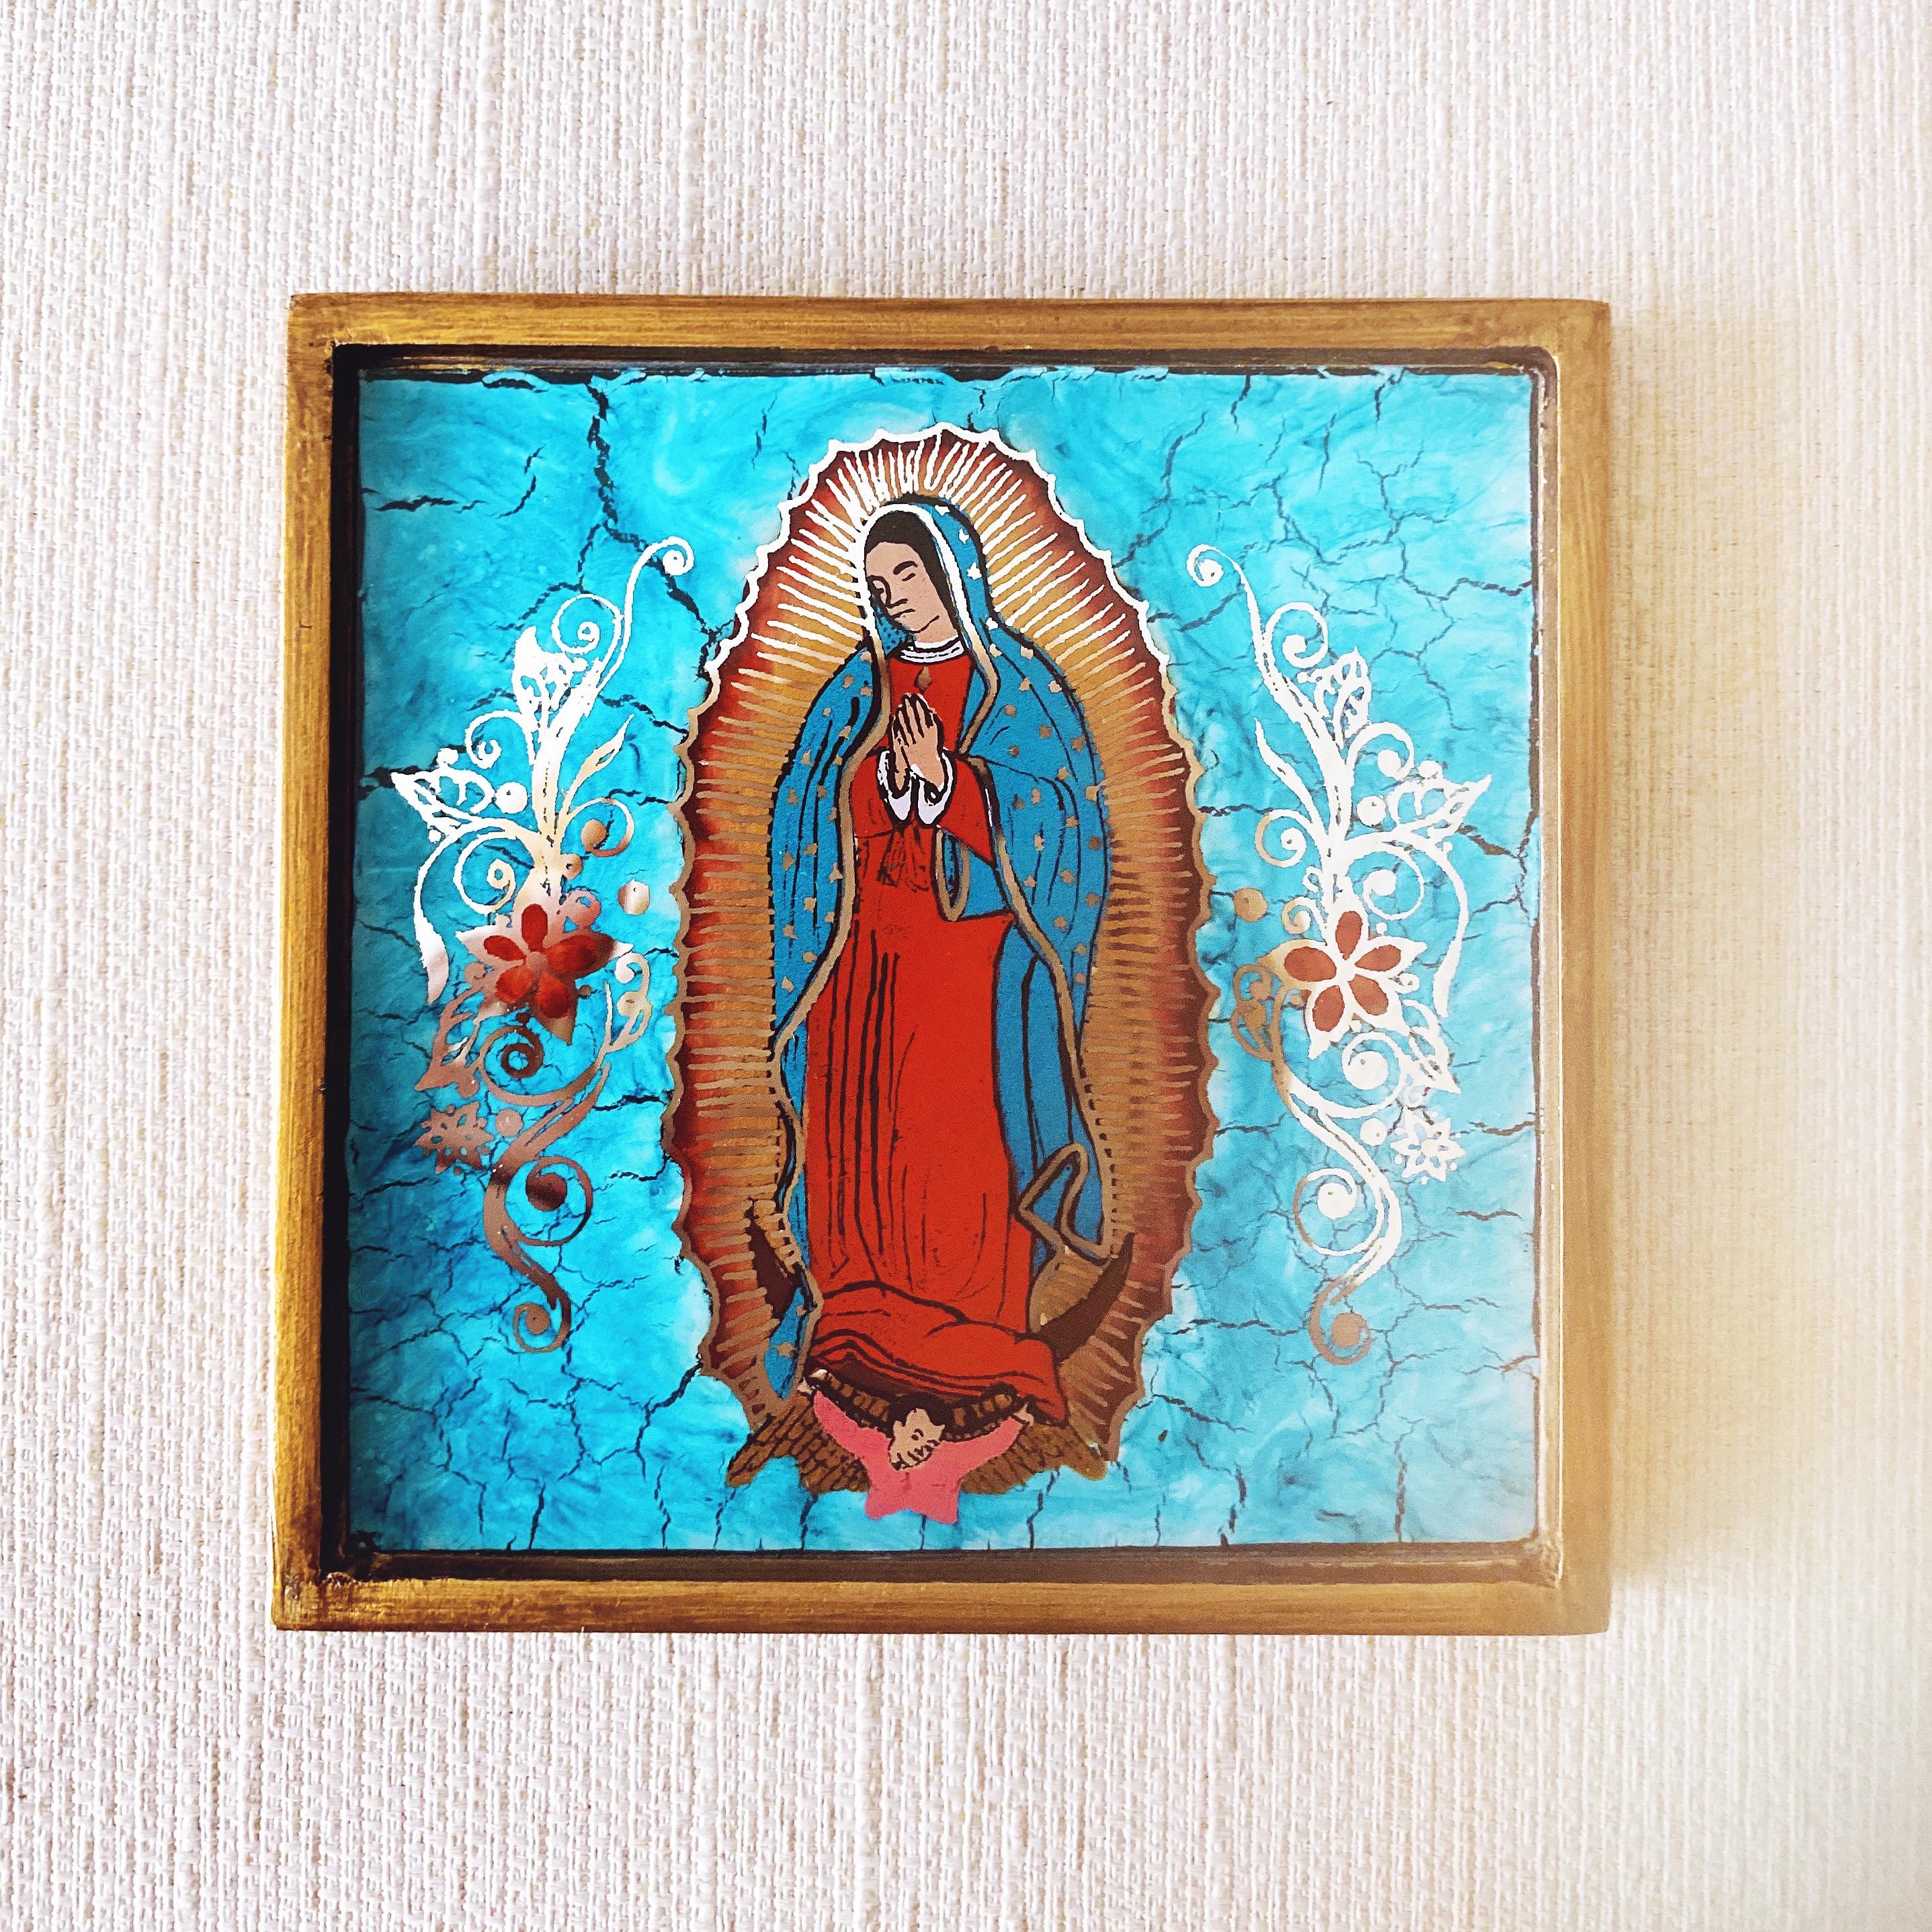 Virgen de Guadalupe Wall Art | Turquoise